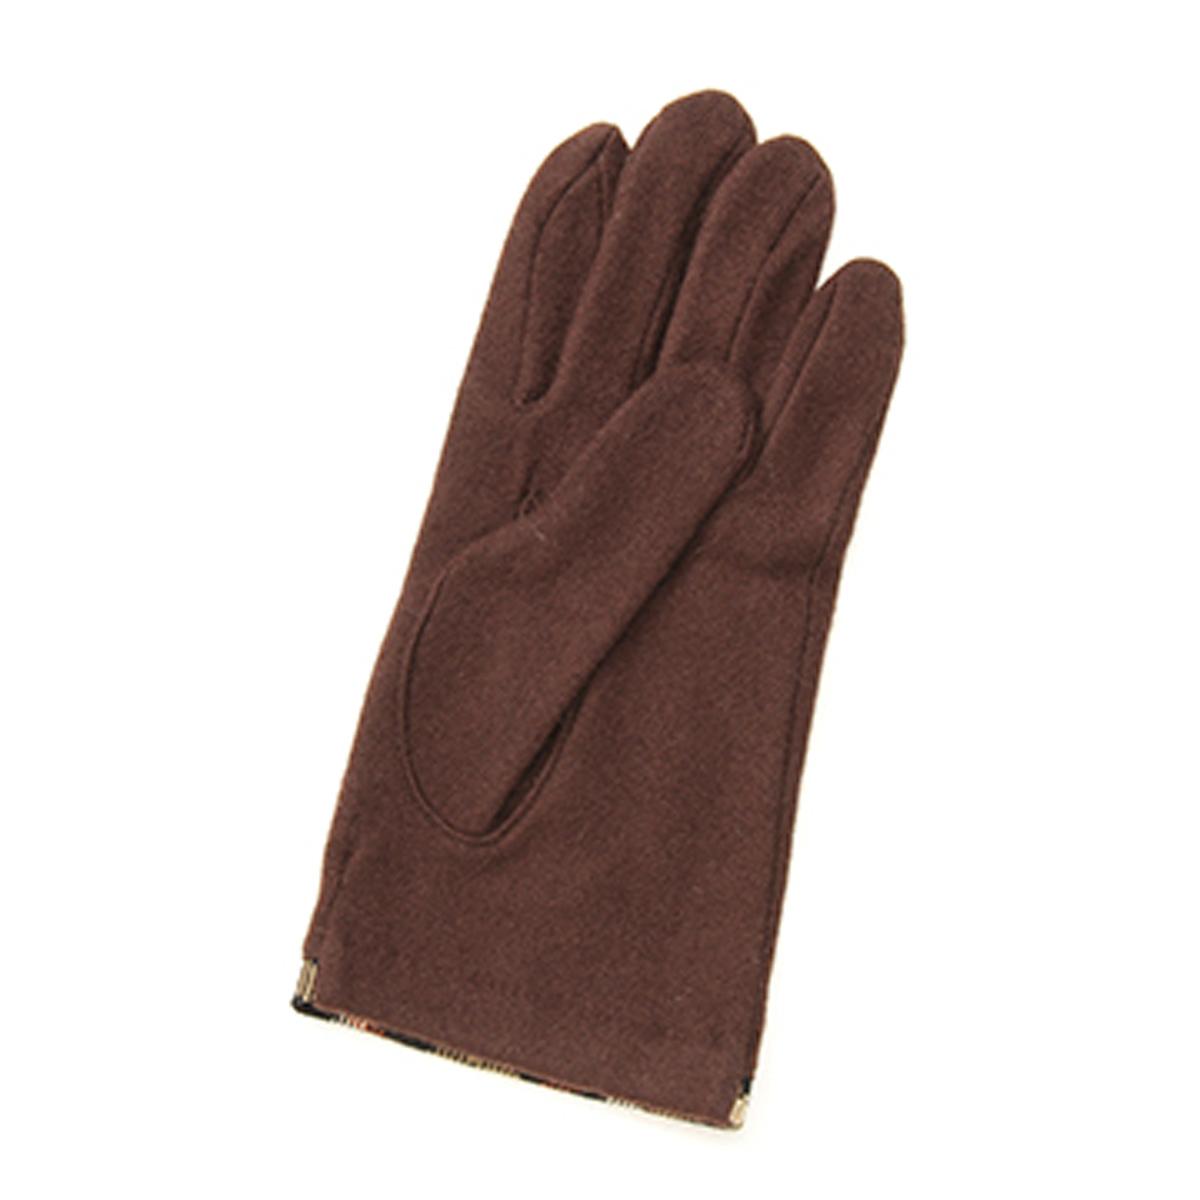 DAKS カシミヤ100% ジャージ メンズ手袋 裾ハウスチェックパイピング 日本製 23〜24cm(M) 全4色